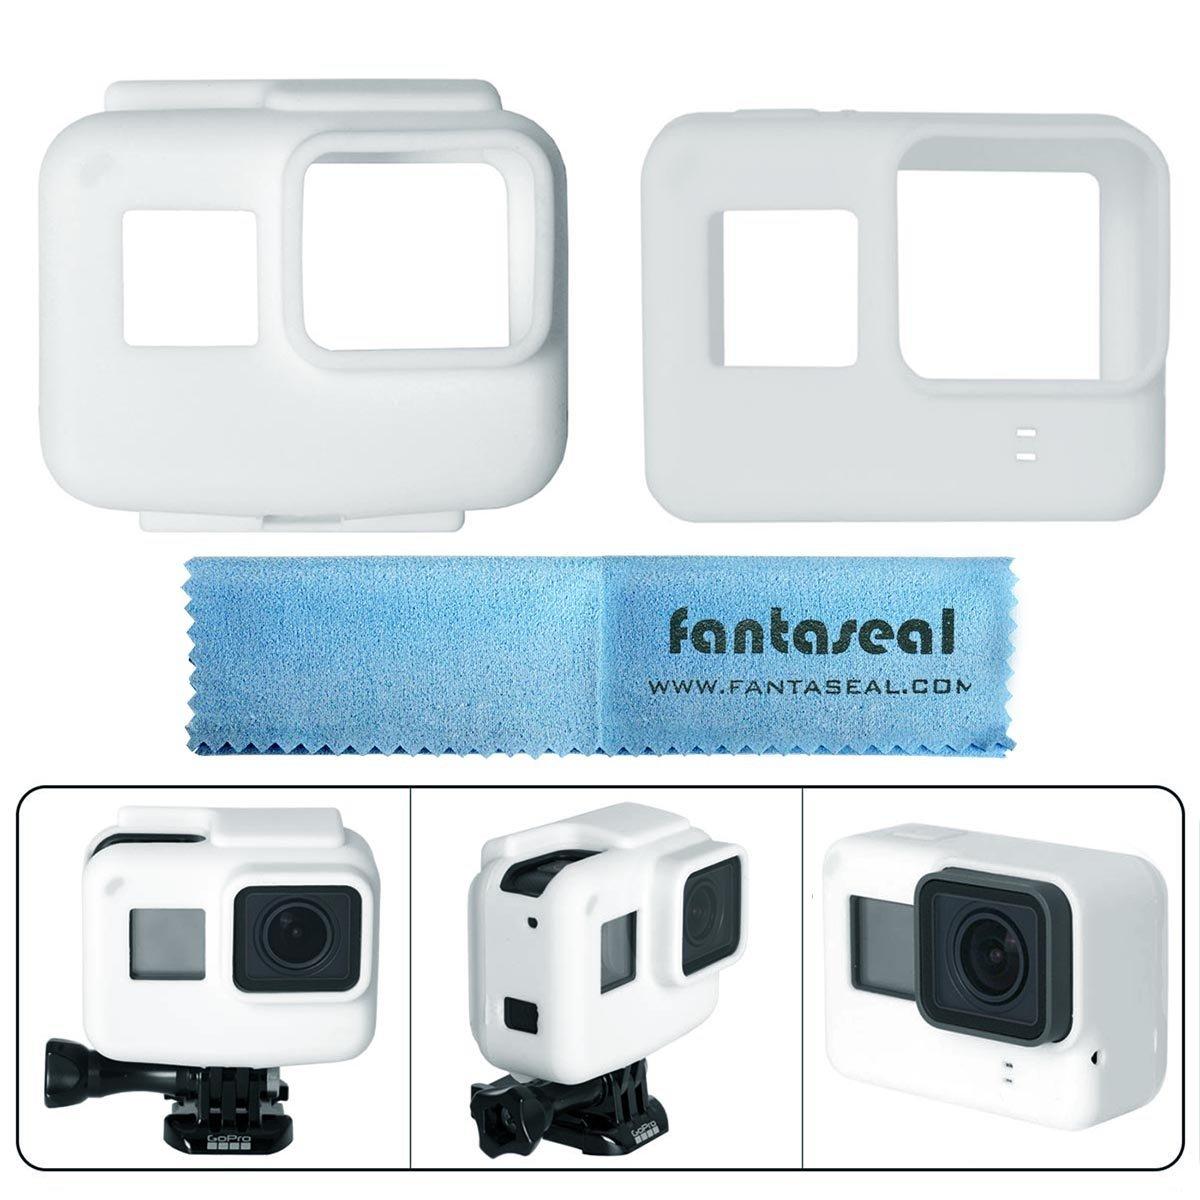 Fantaseal Silicone Case for Gopro Hero 5 Black Frame Silicone Protective Case + GoPro Hero5 Camera Silicone Case Shell for GoPro Hero 5 + Super Micro-Fiber Lens Cloth -White